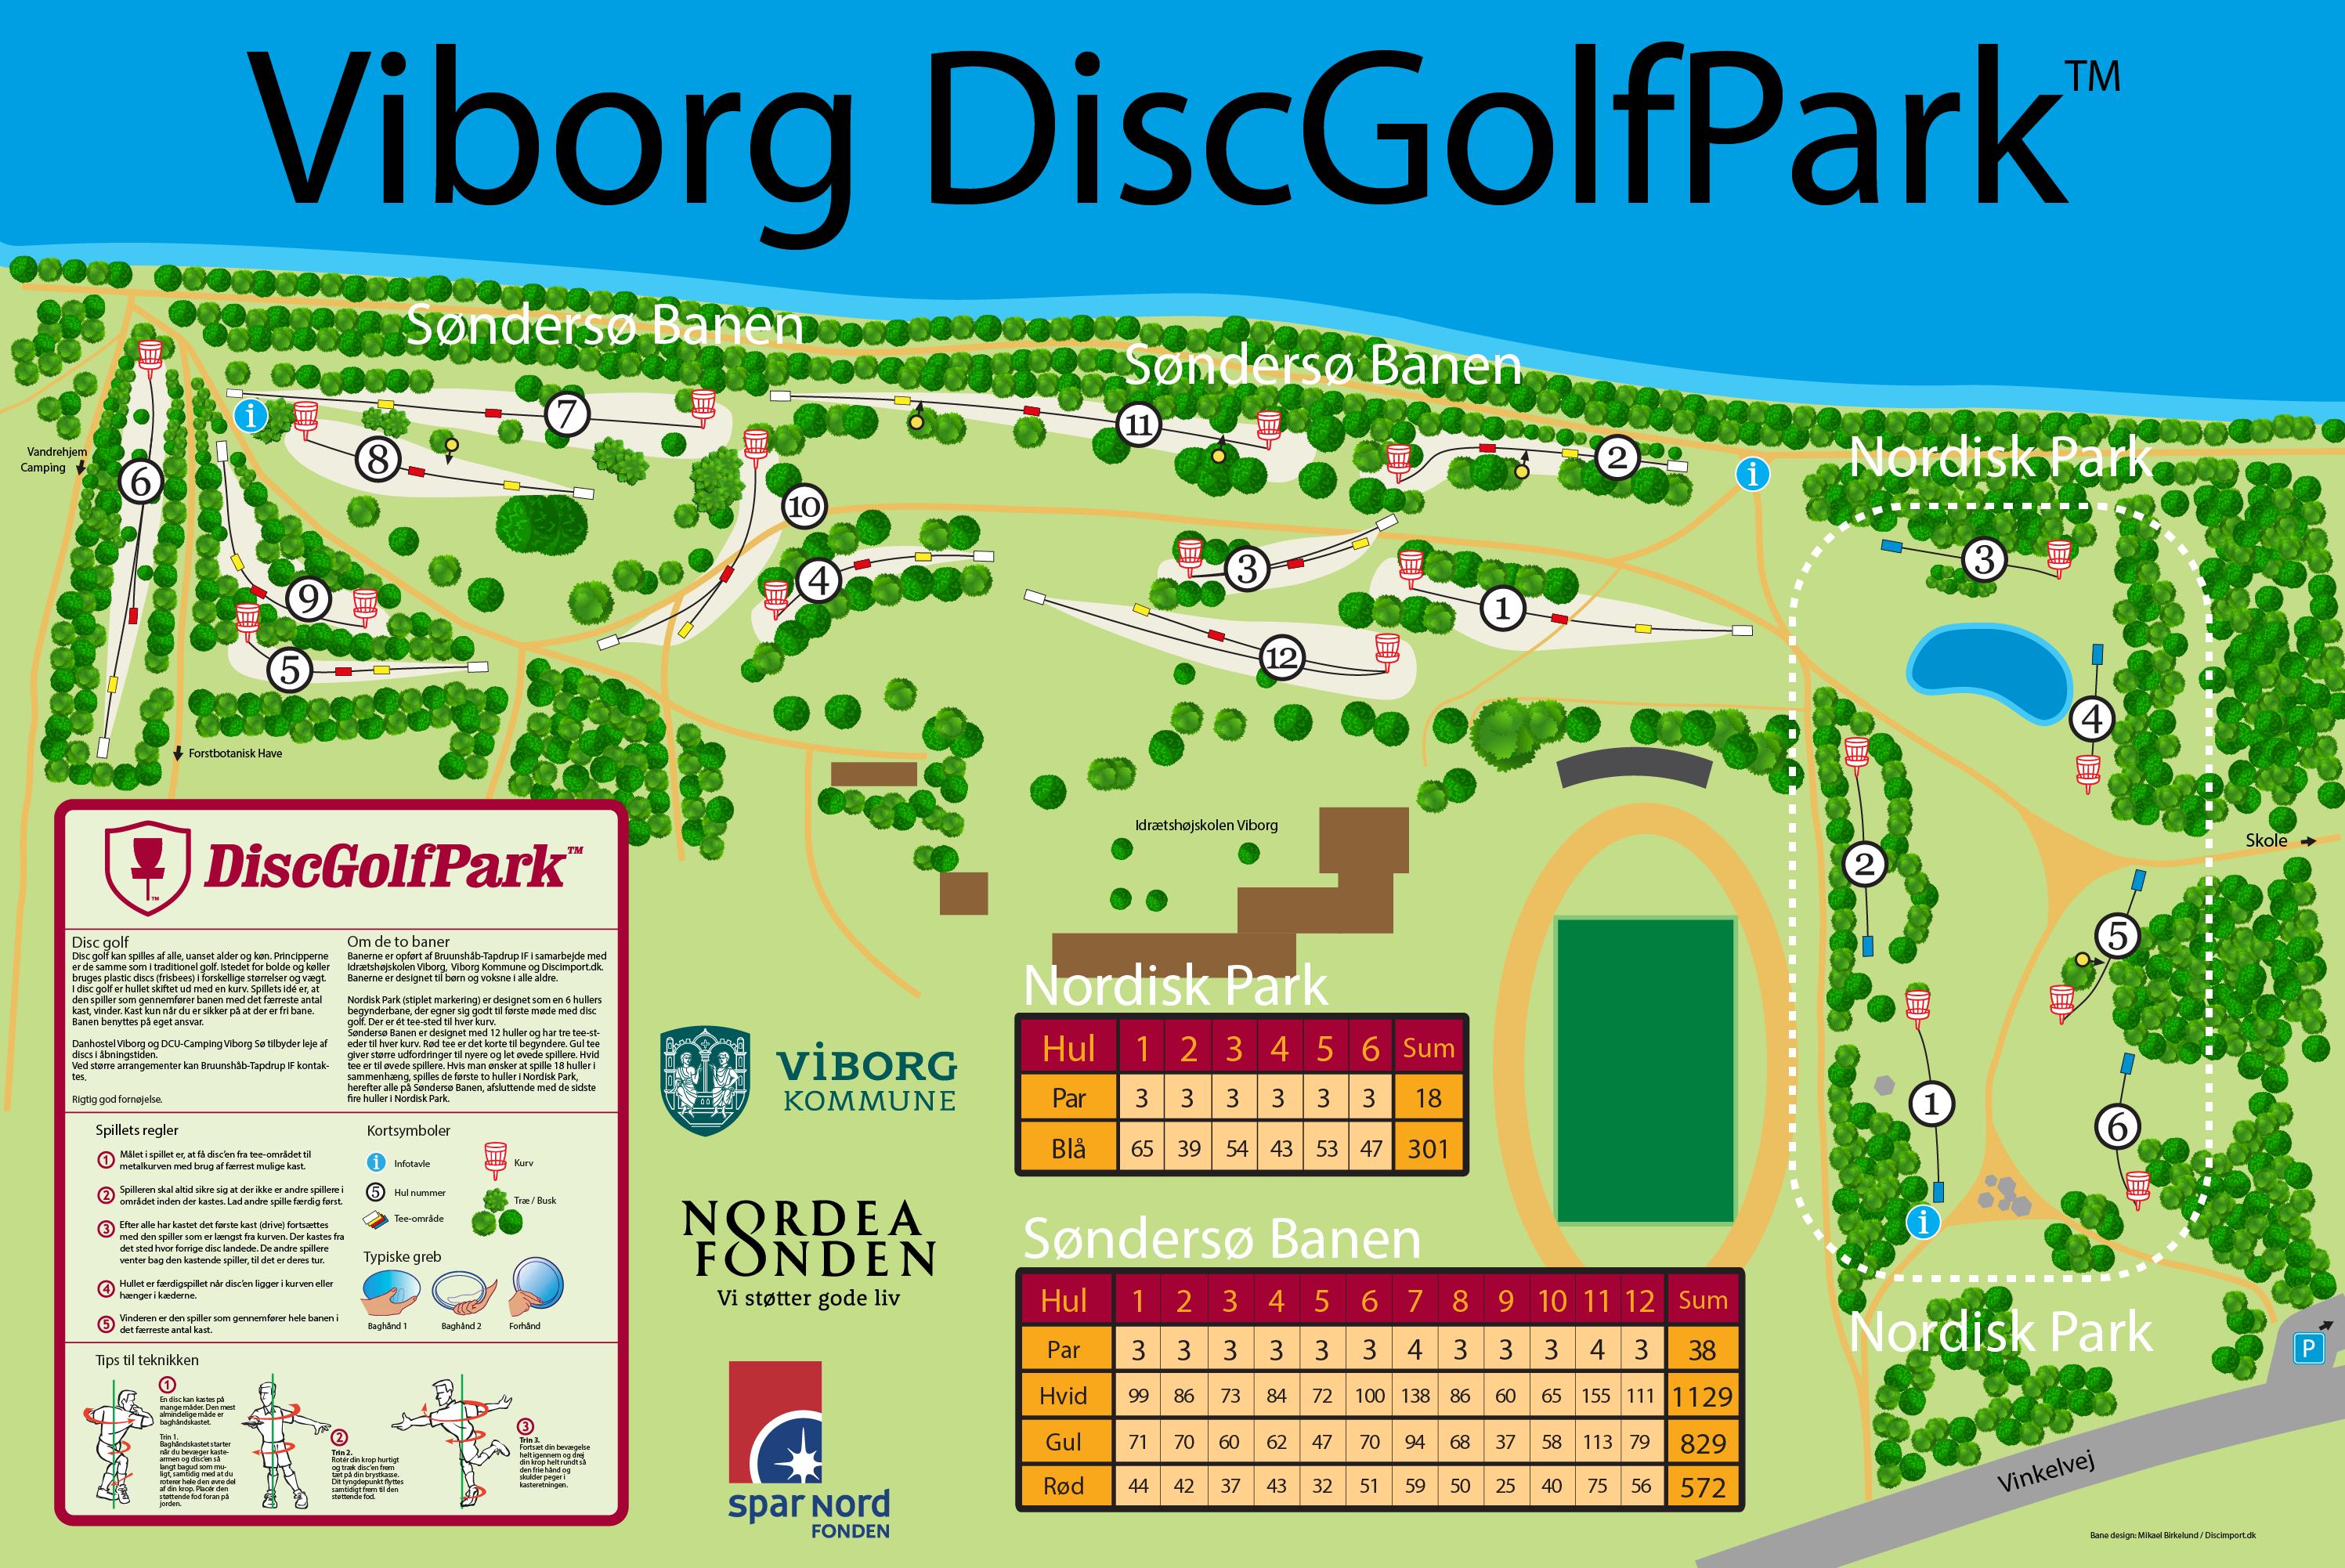 Viborg DiscGolfPark - DiscGolfPark